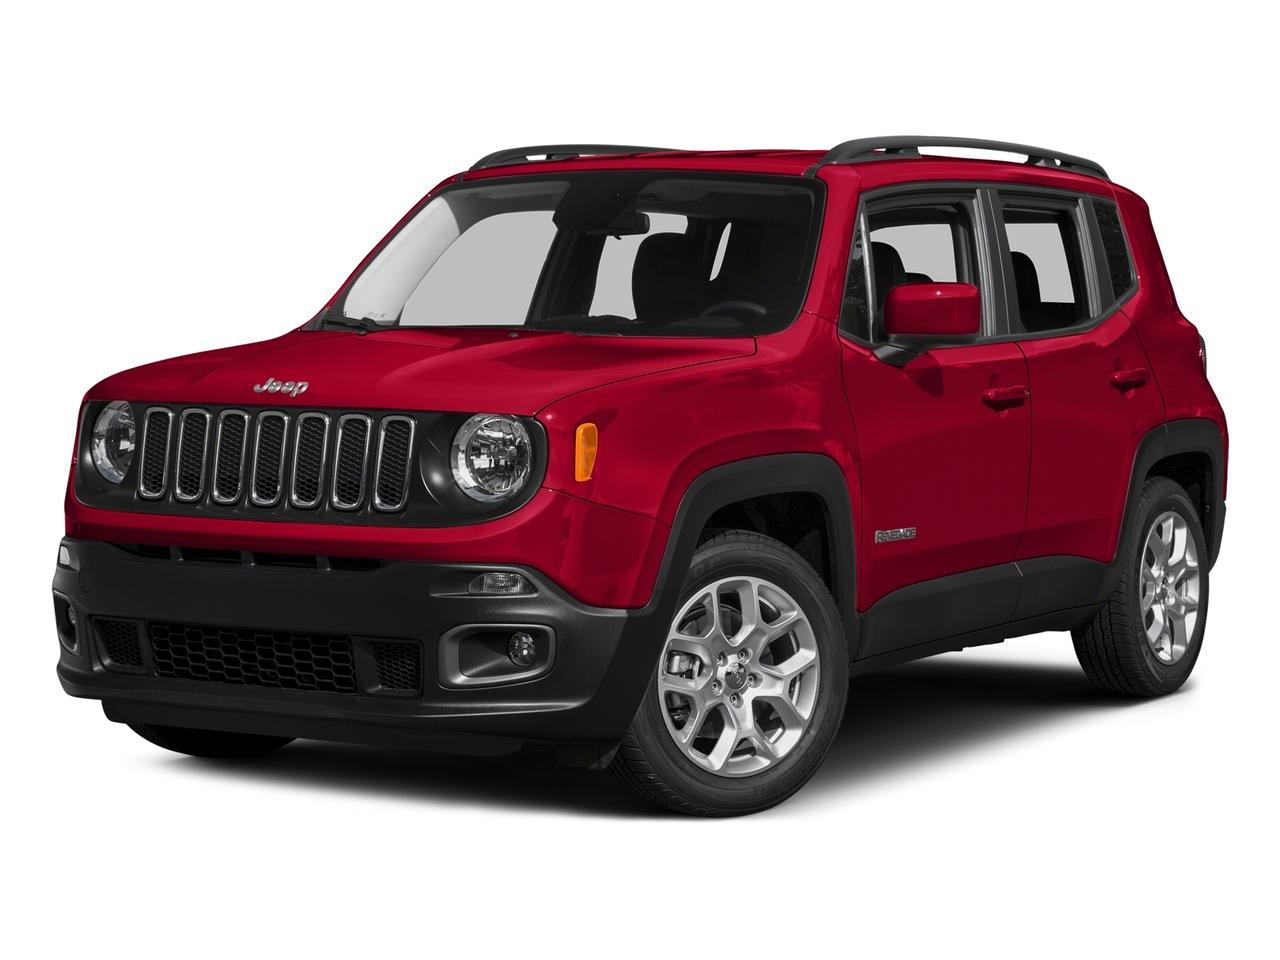 2015 Jeep Renegade Vehicle Photo in Corpus Christi, TX 78411